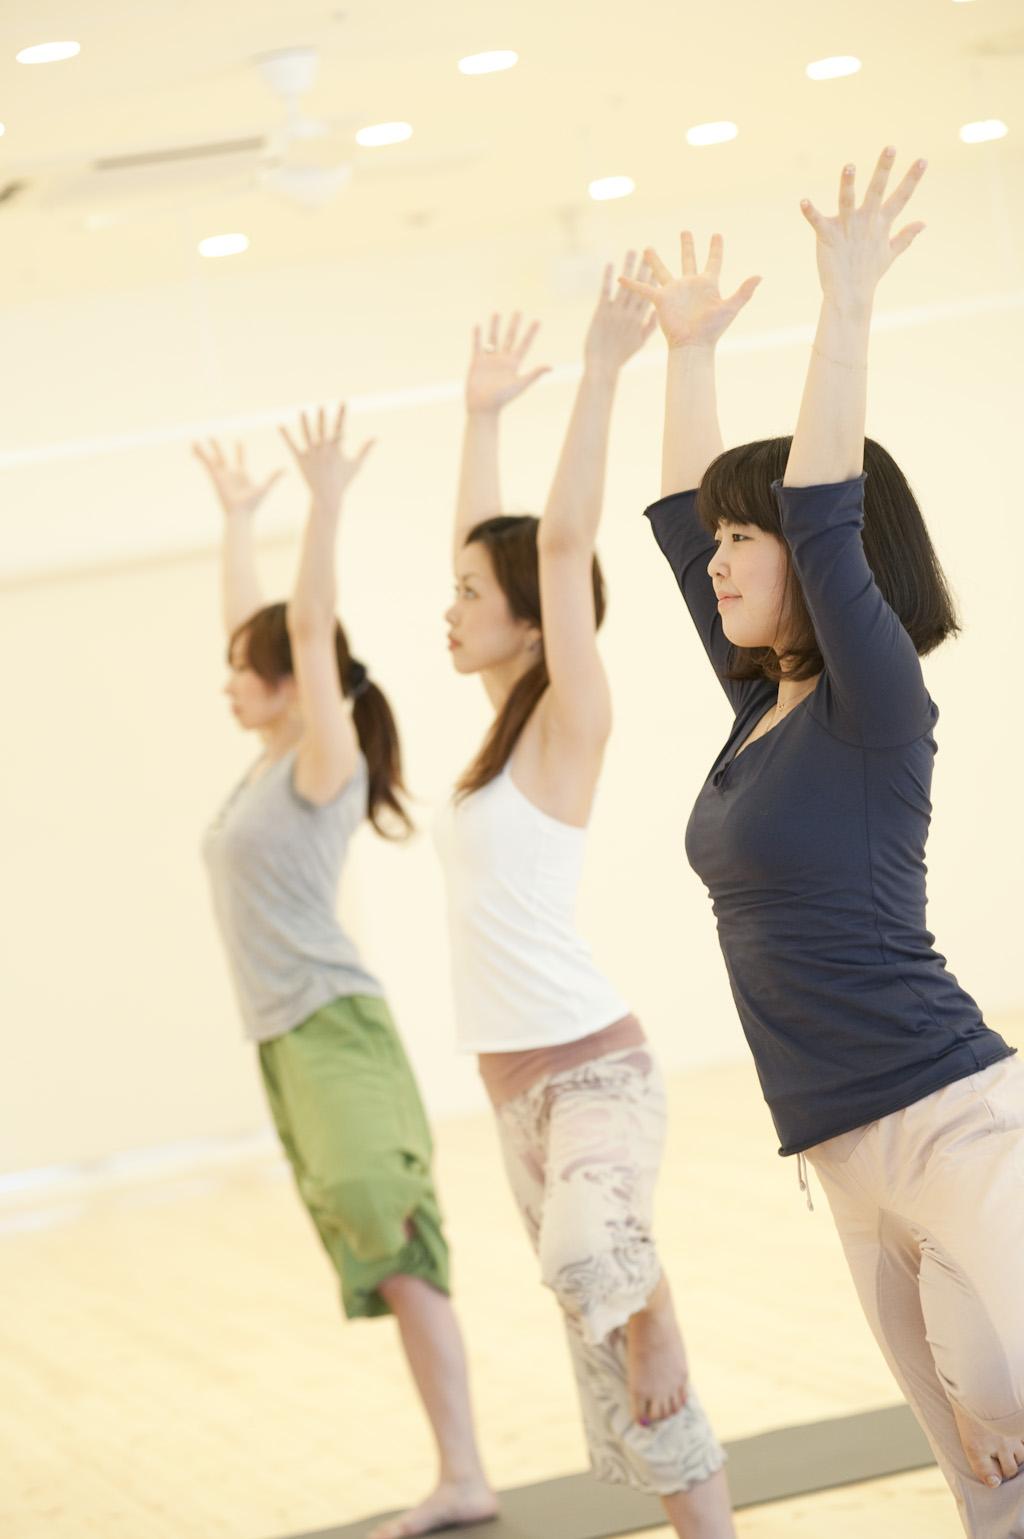 [23L1] Yoga for All Woman ~女性のためのヨガ~